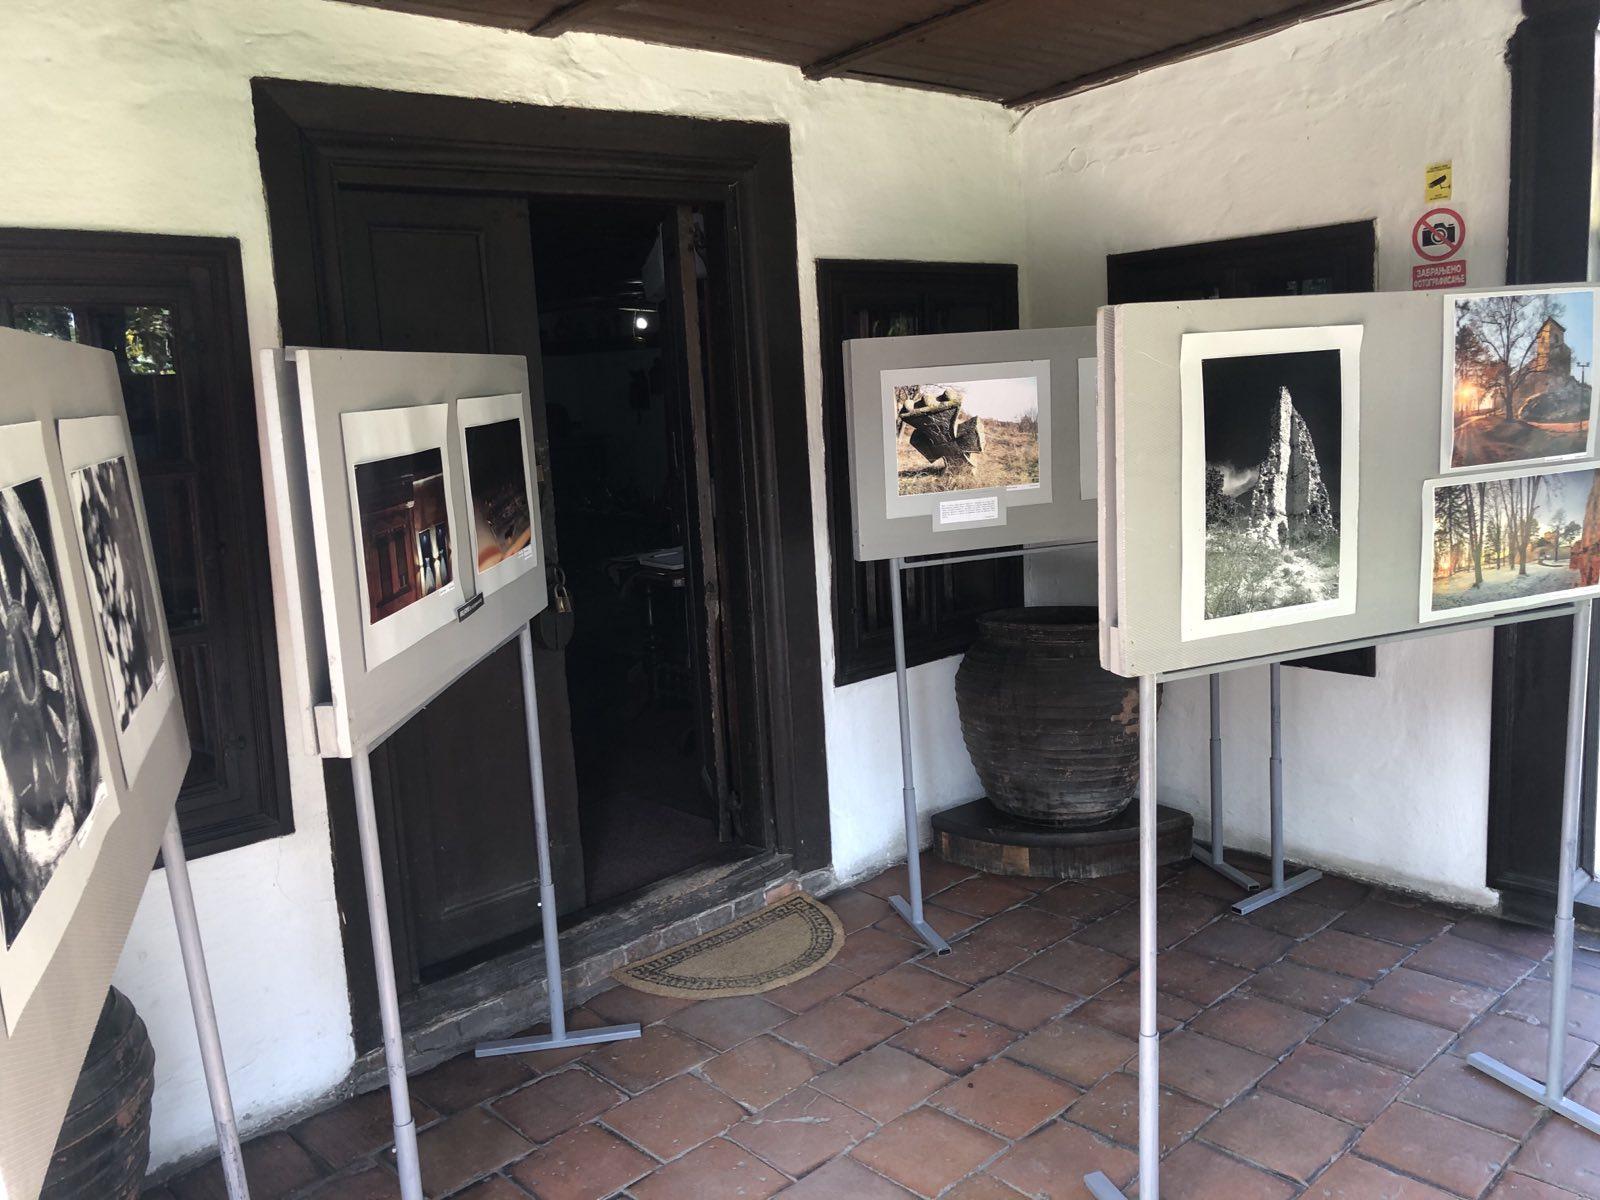 izlozba pirot muzej nebriga o kulturnom nasledju